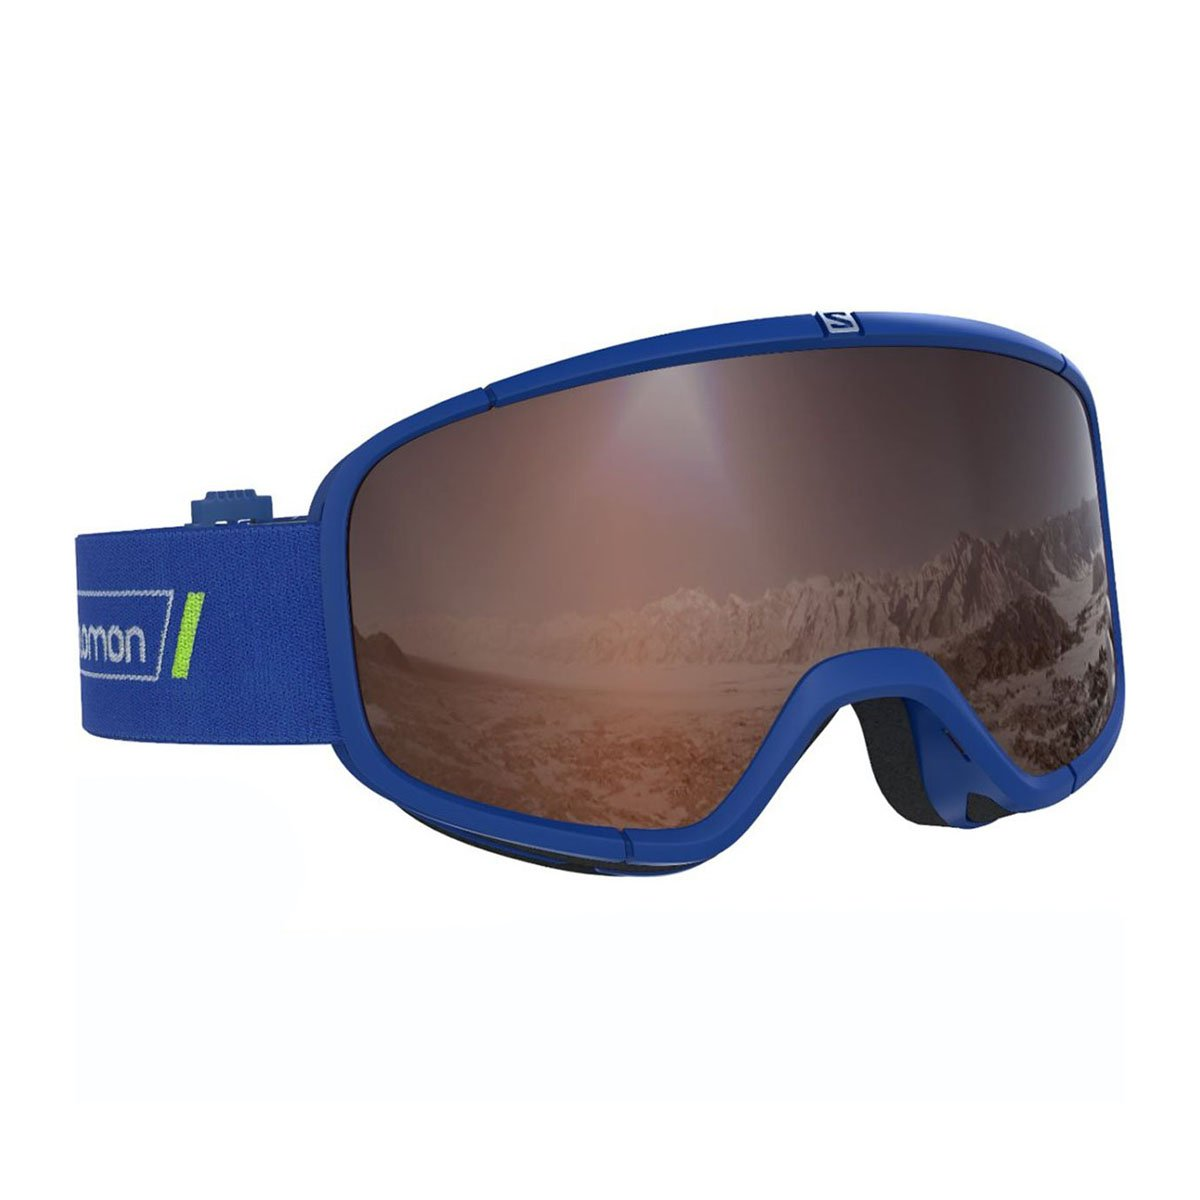 203ba0d702 Store13.hu - snowboard, sí, gördeszka, longboard, cipő, boardshort ...